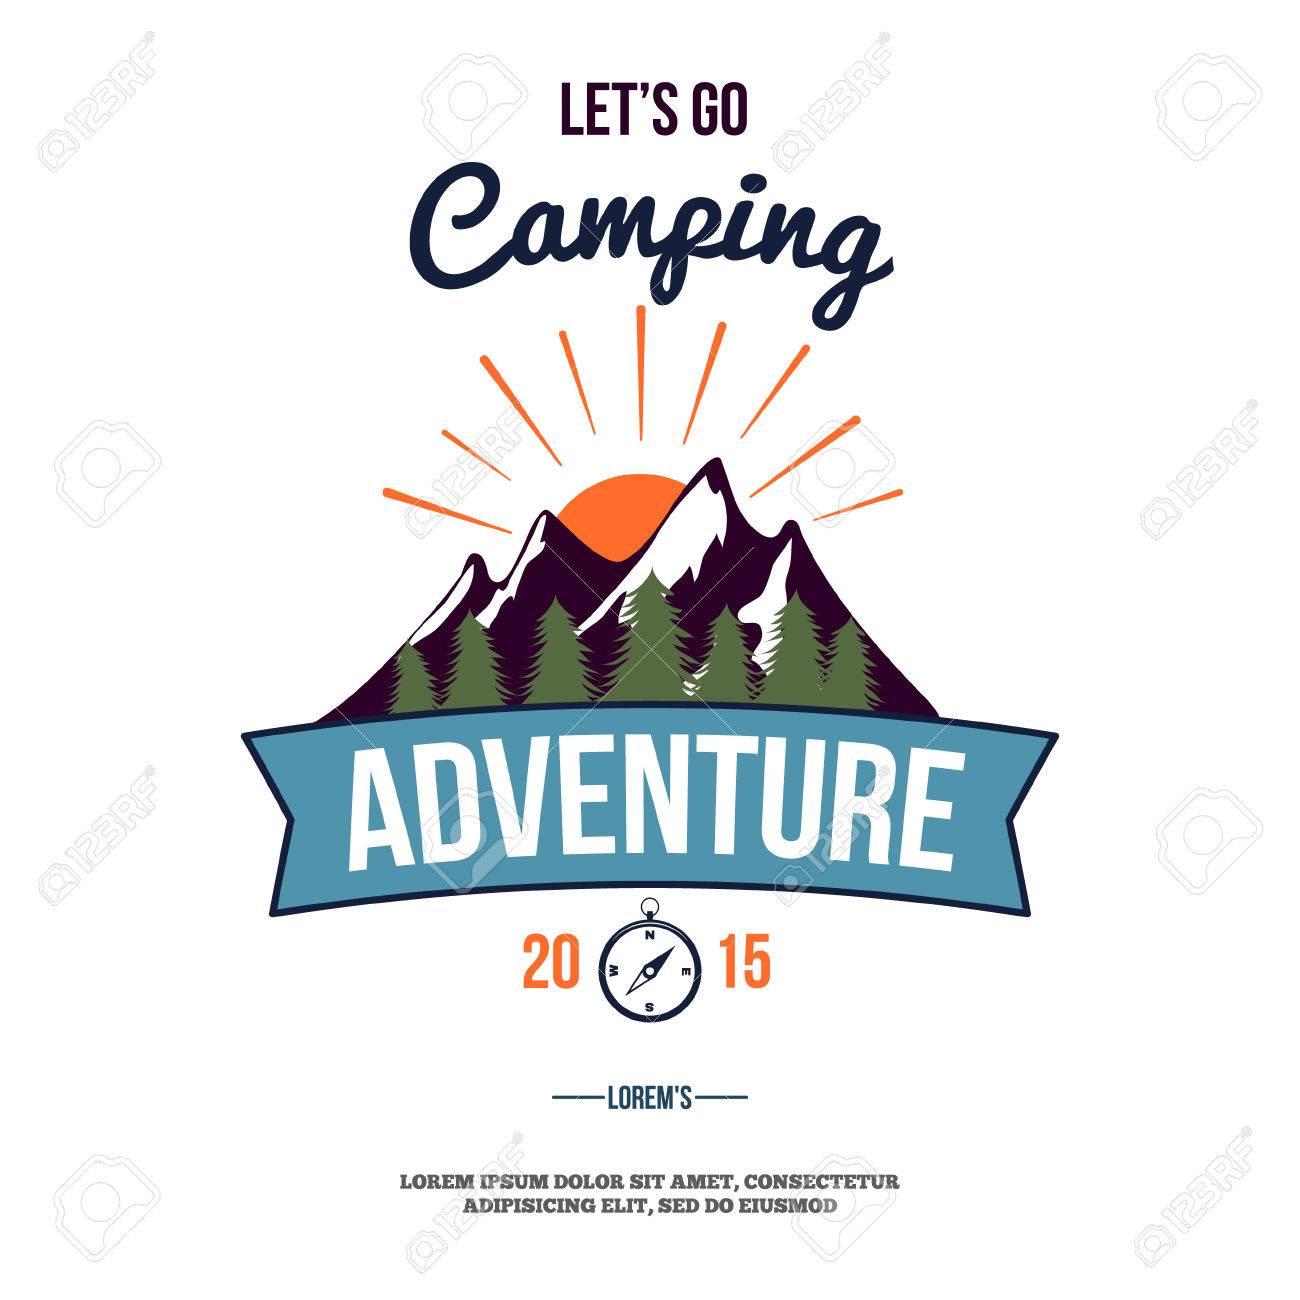 camping wilderness adventure badge graphic design logo emblem vector illustration - 42278436